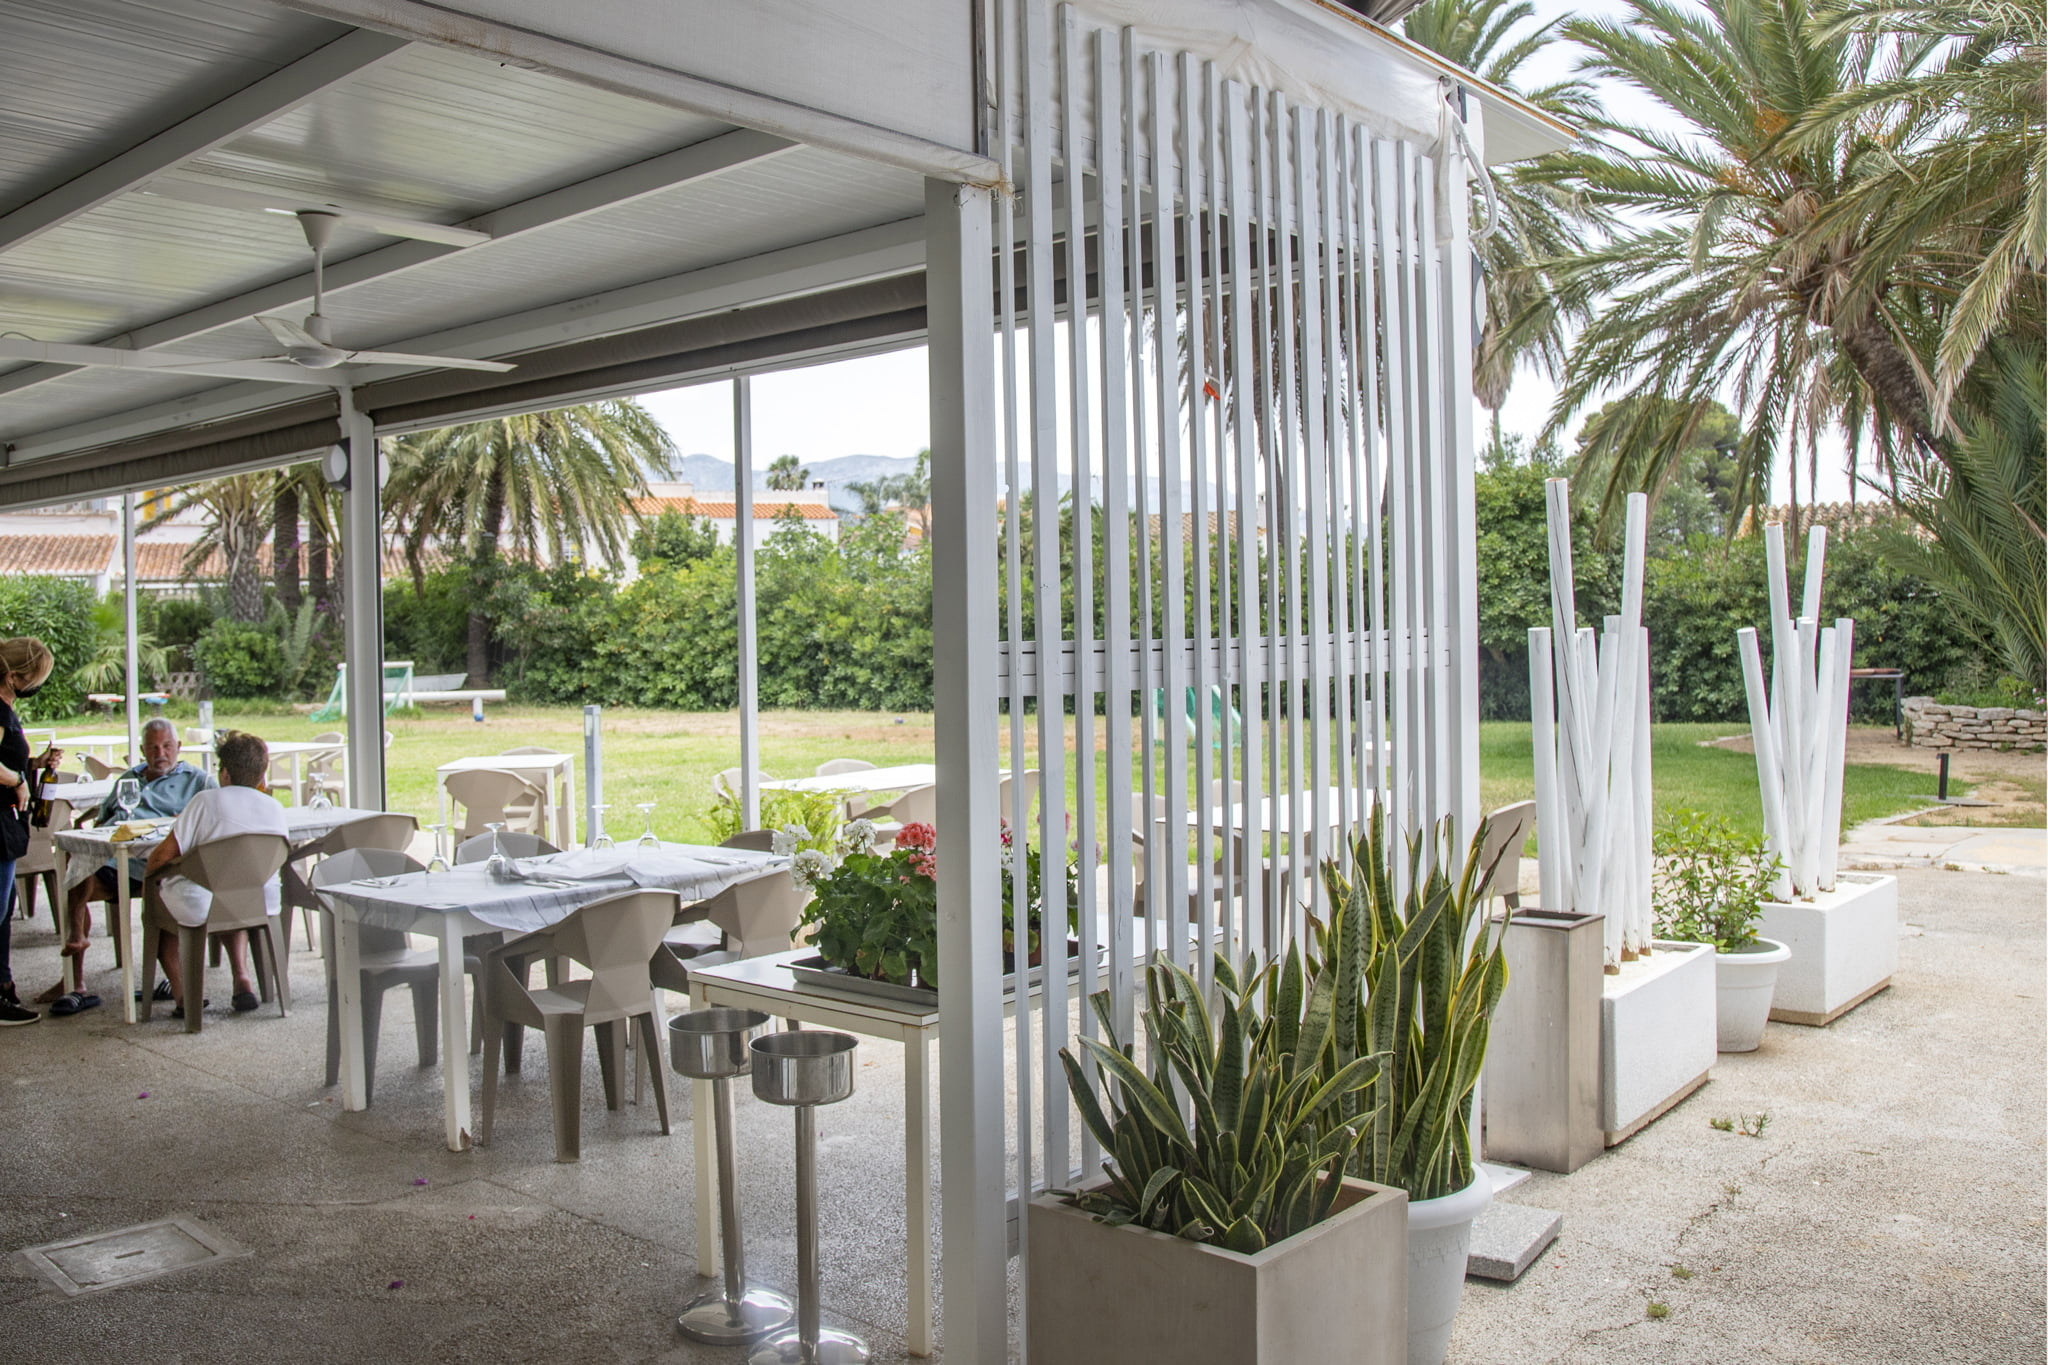 Mejor restaurante en Denia – Restaurante Voramar